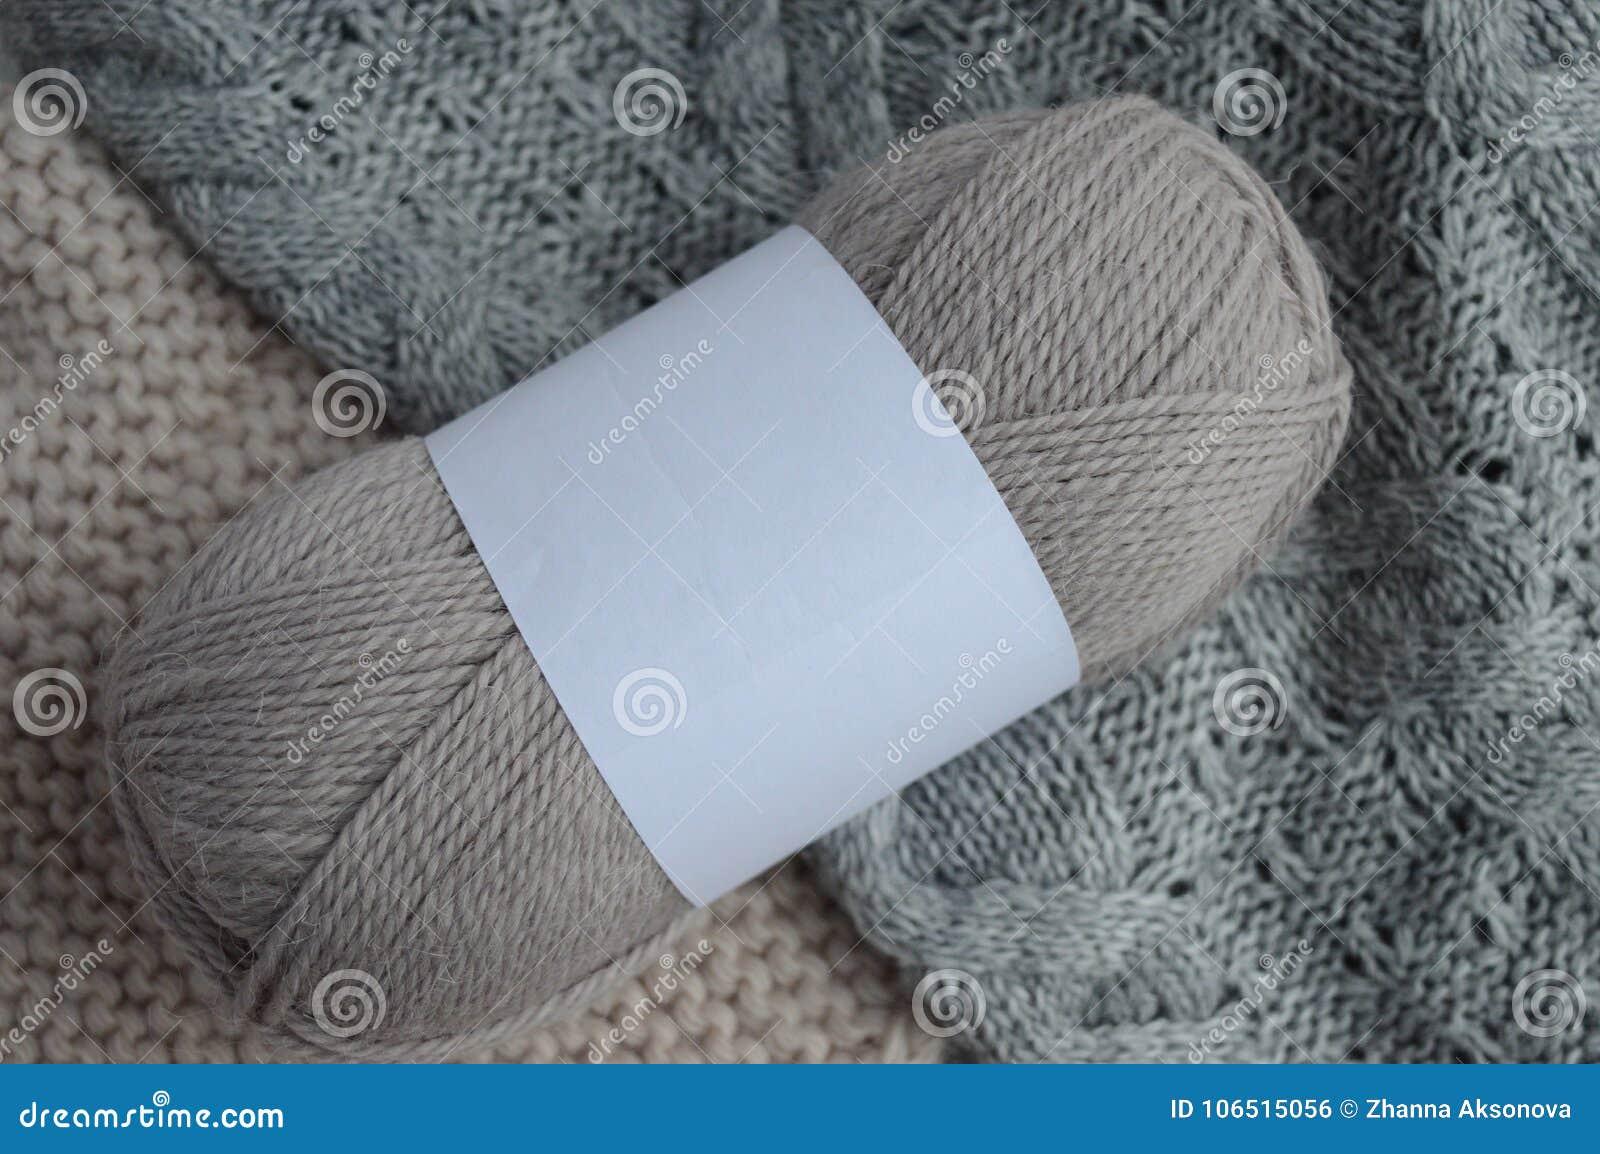 0b3f206fe5e2 E Πλέξιμο Φυσικό μαλλί Πλεκτό πουλόβερ Στοκ Εικόνες - εικόνα από ...